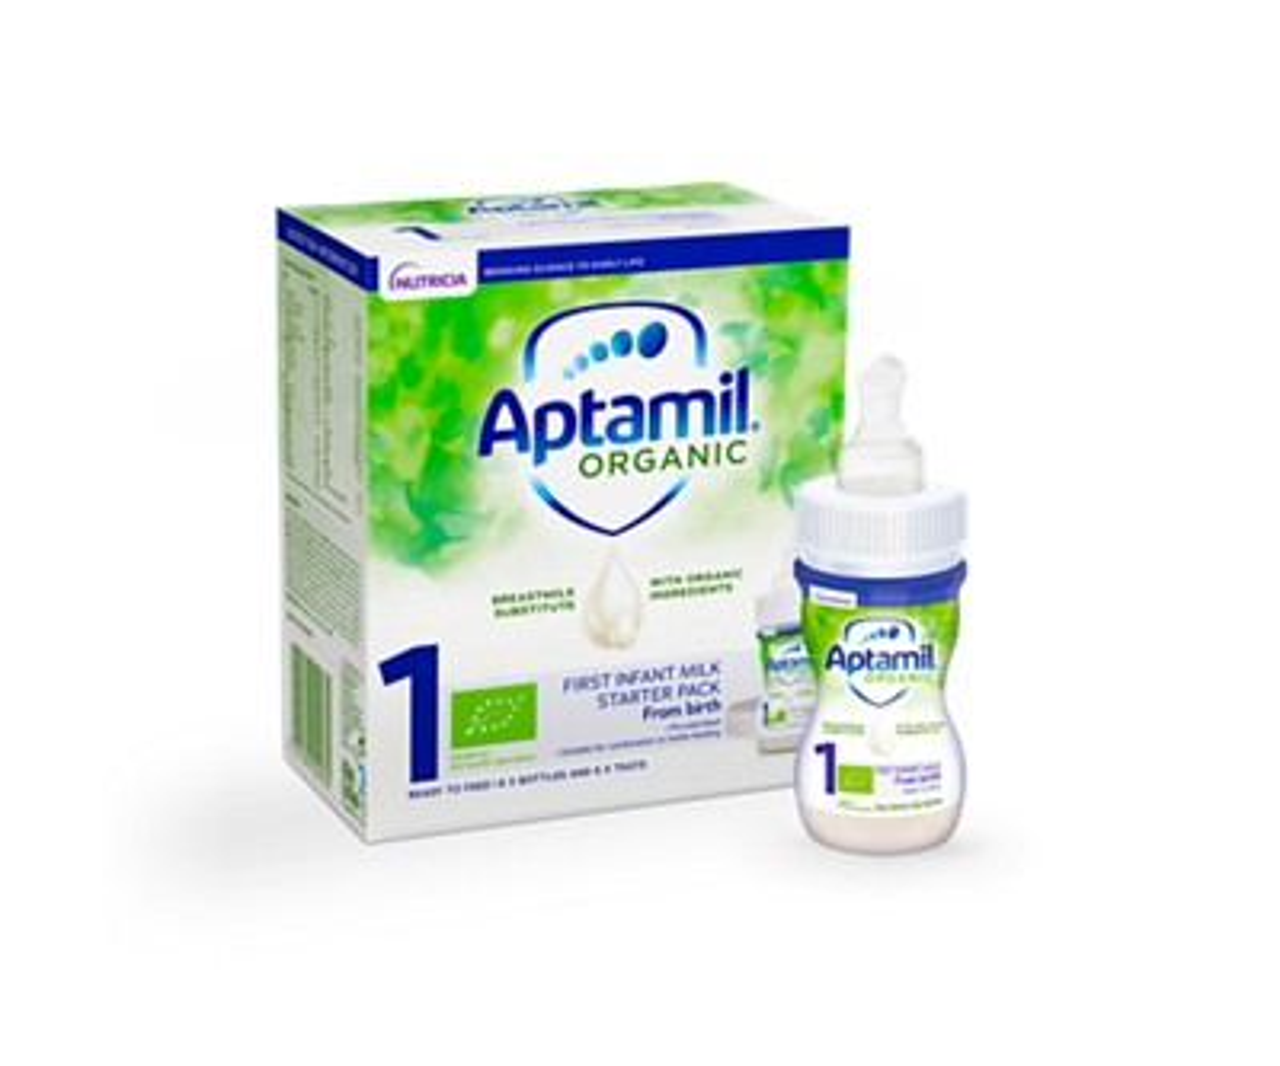 aptamil-organic-if-70ml-starter-pack-angled